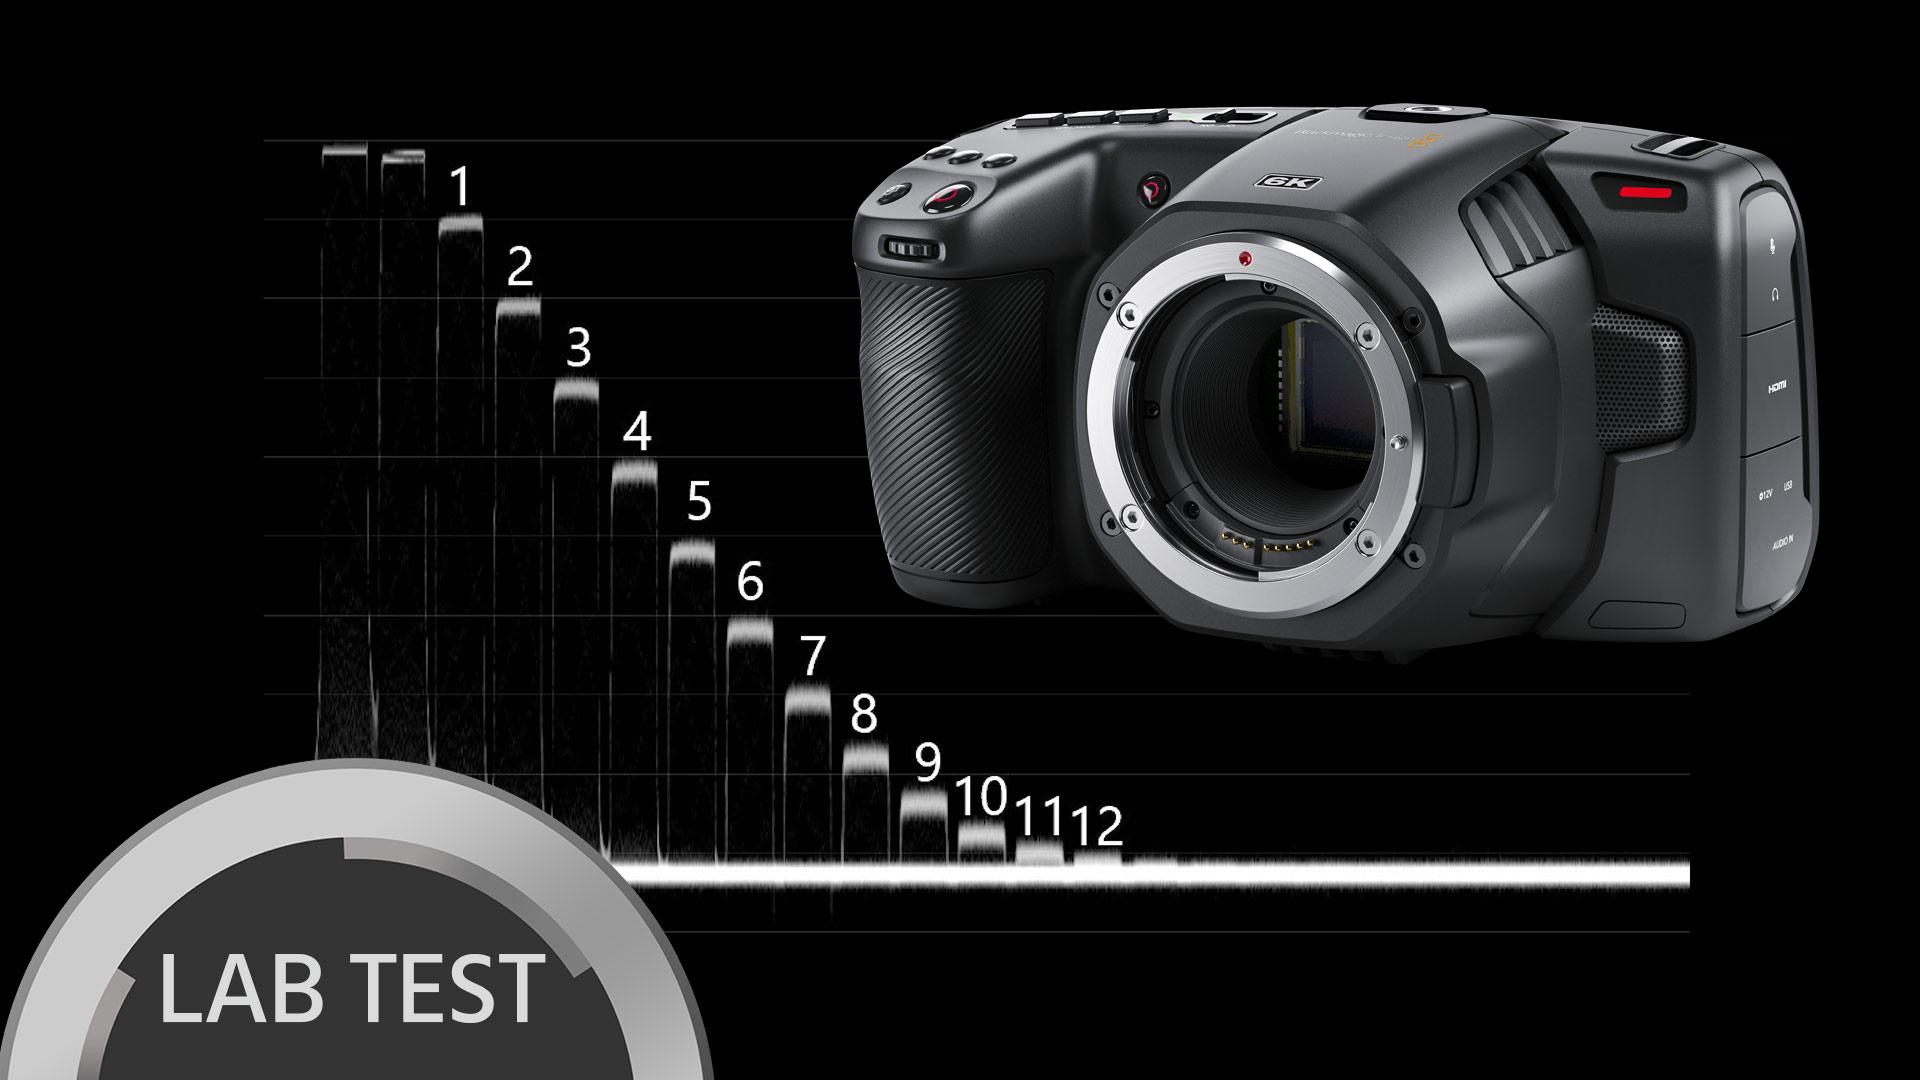 Blackmagic Pocket Cinema Camera 6K Lab Test - Dynamic Range, Latitude, Rolling Shutter & More | cinema5D